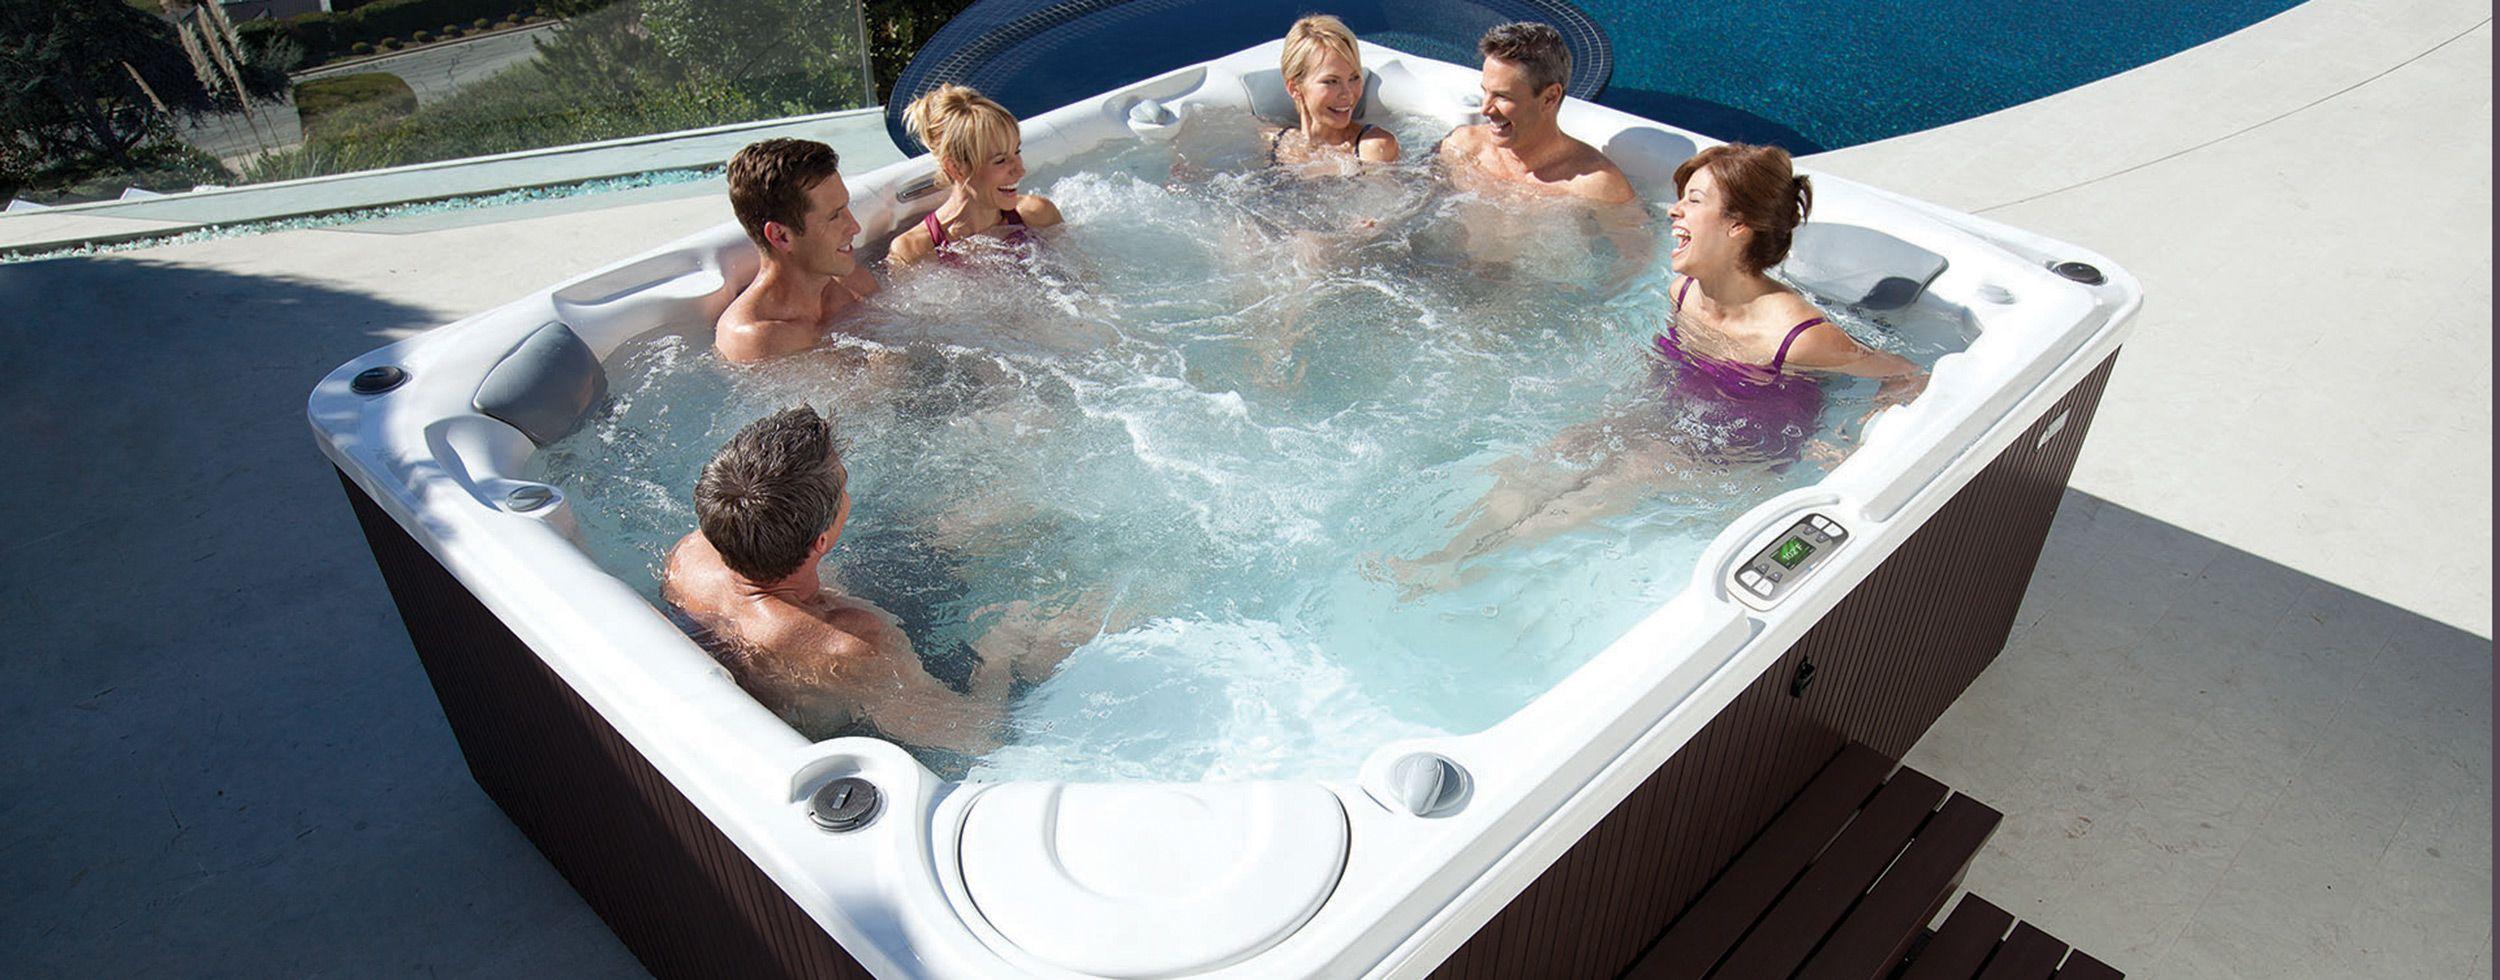 8 Person Large Hot Tub Gleam | Hot Spring Spas | Spas | Pinterest ...